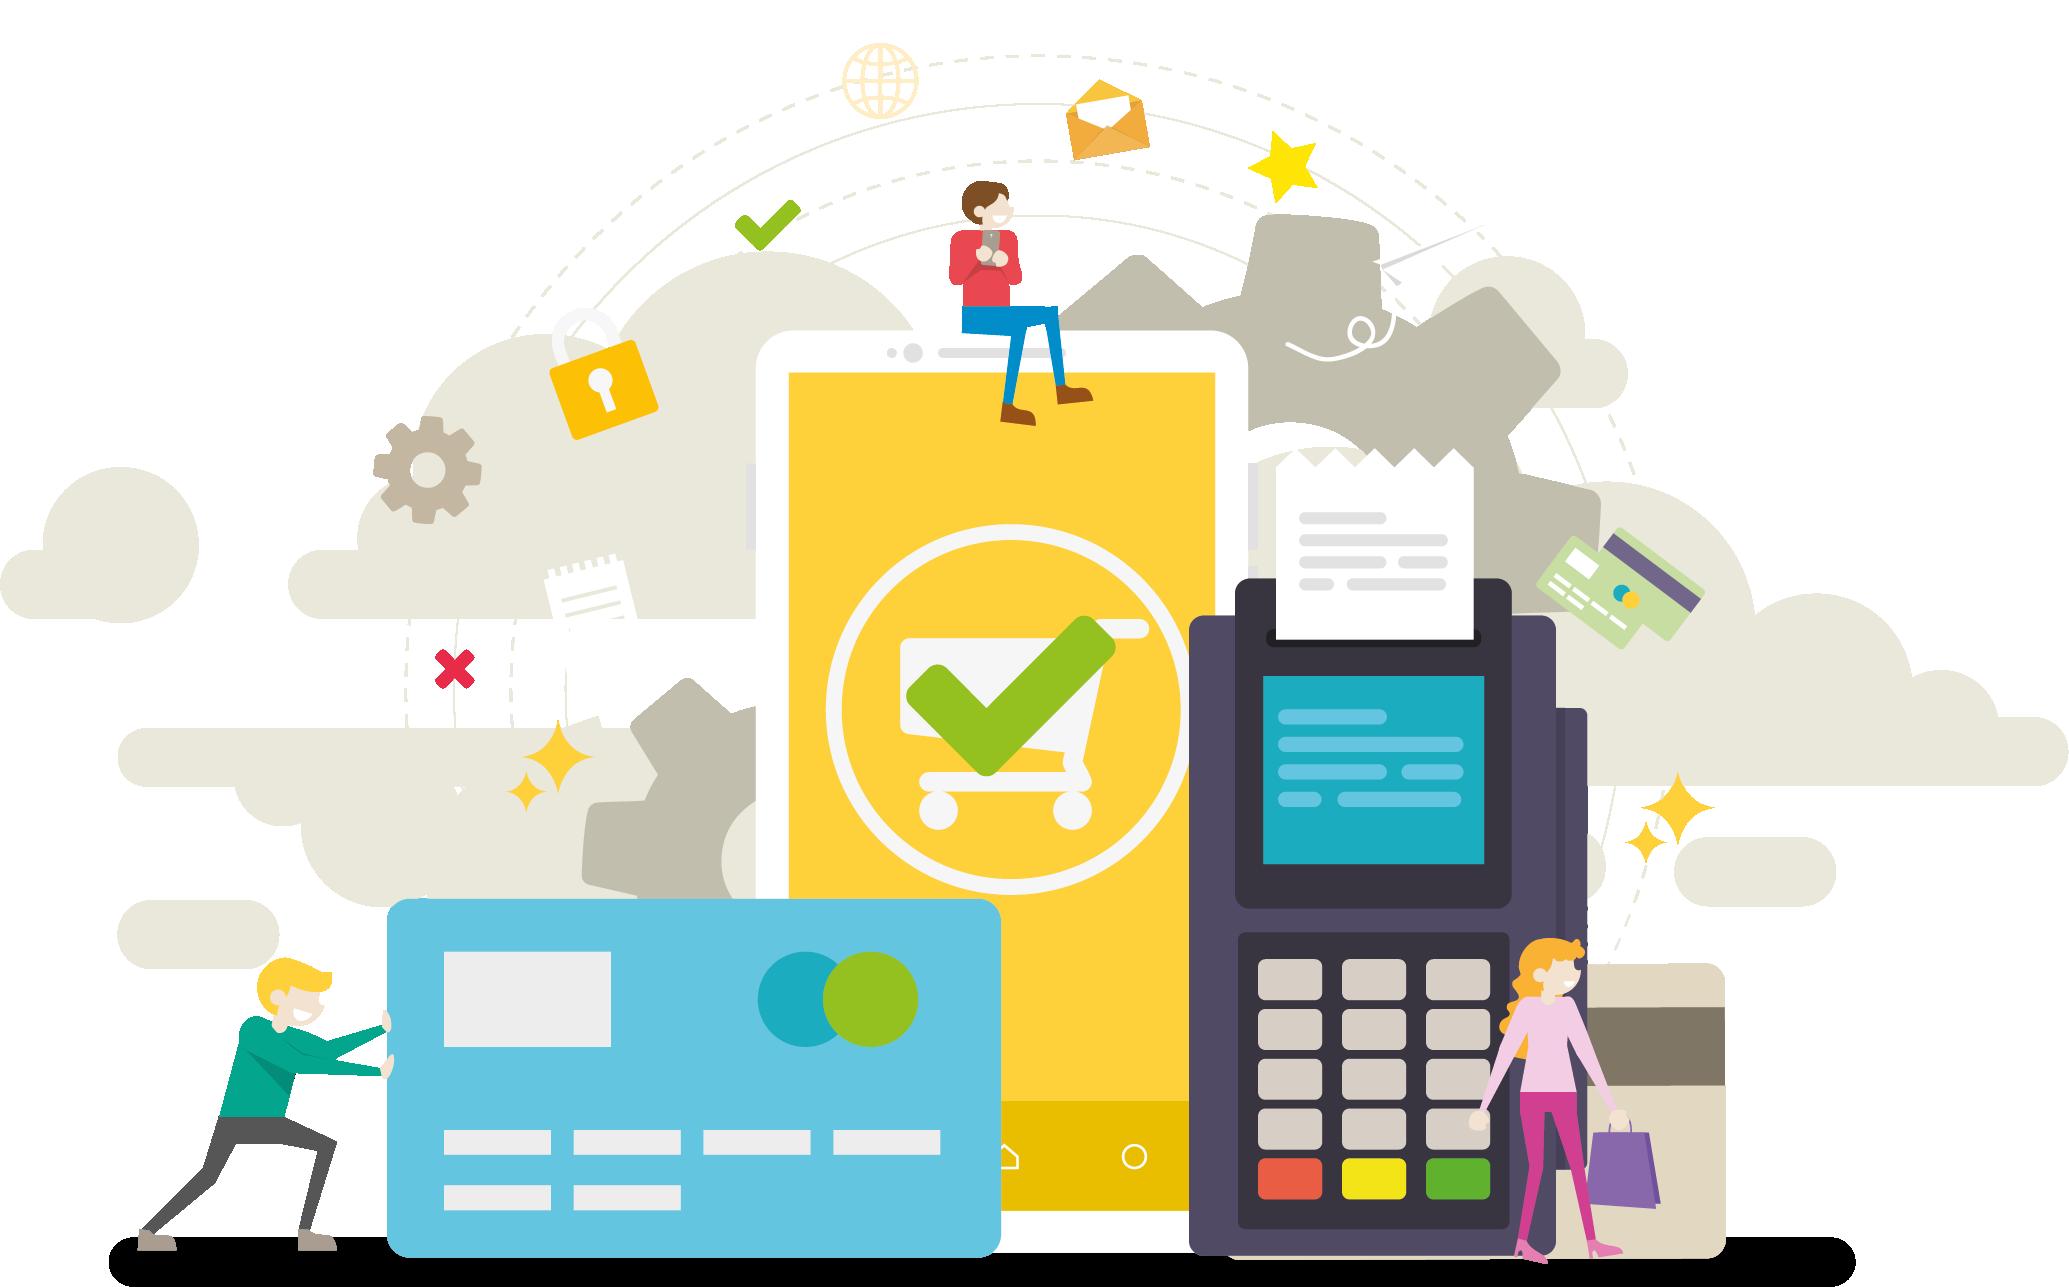 Ecommerce Solutions illustration